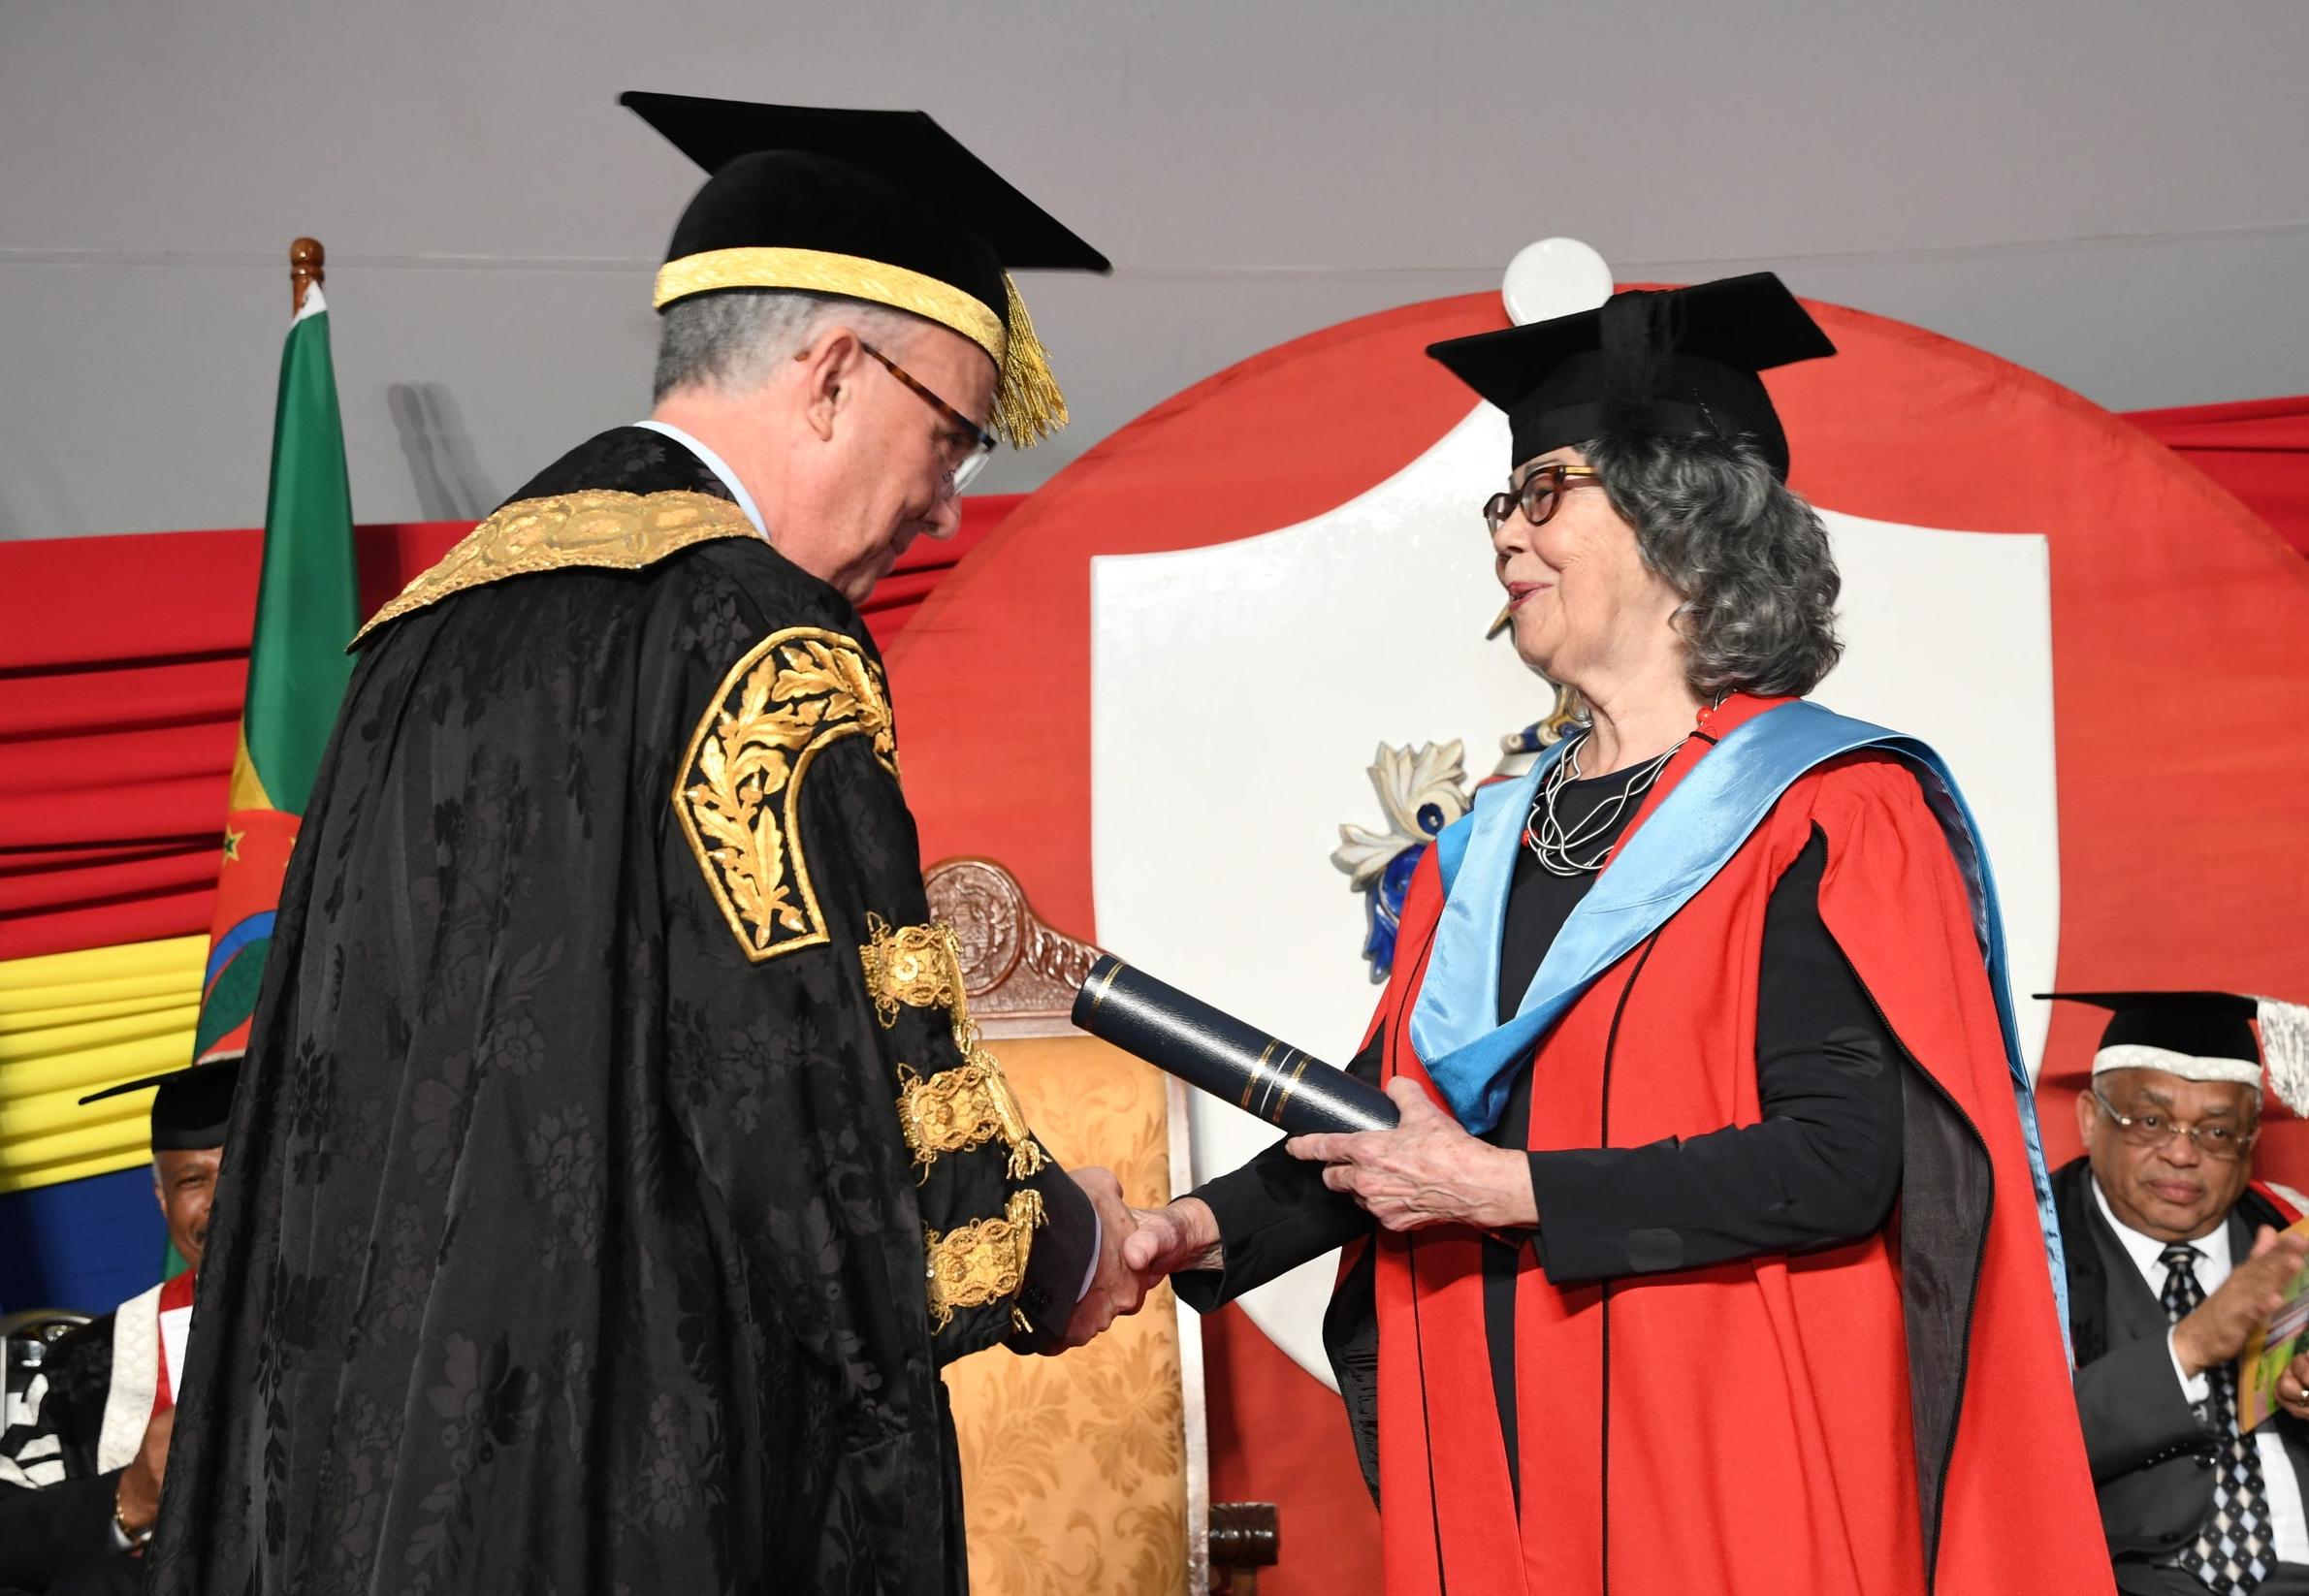 UWI chancellor Richard Bermudez presents the honourary degree to Olive Senior